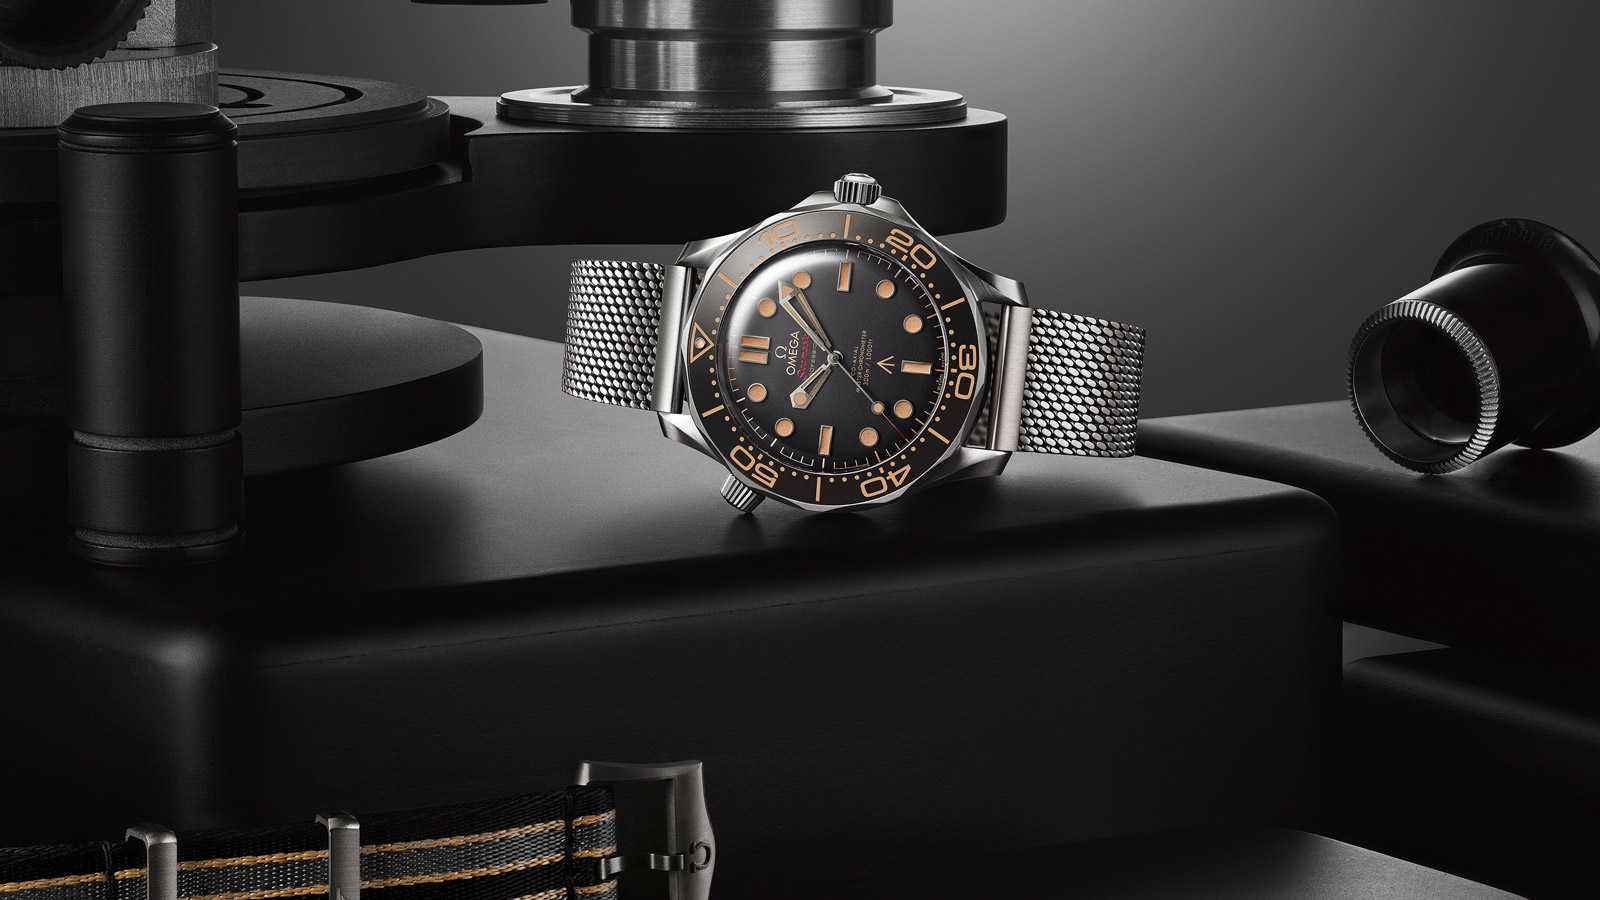 SE-Diver300M-007Edition-Slideshow2-new-large_9